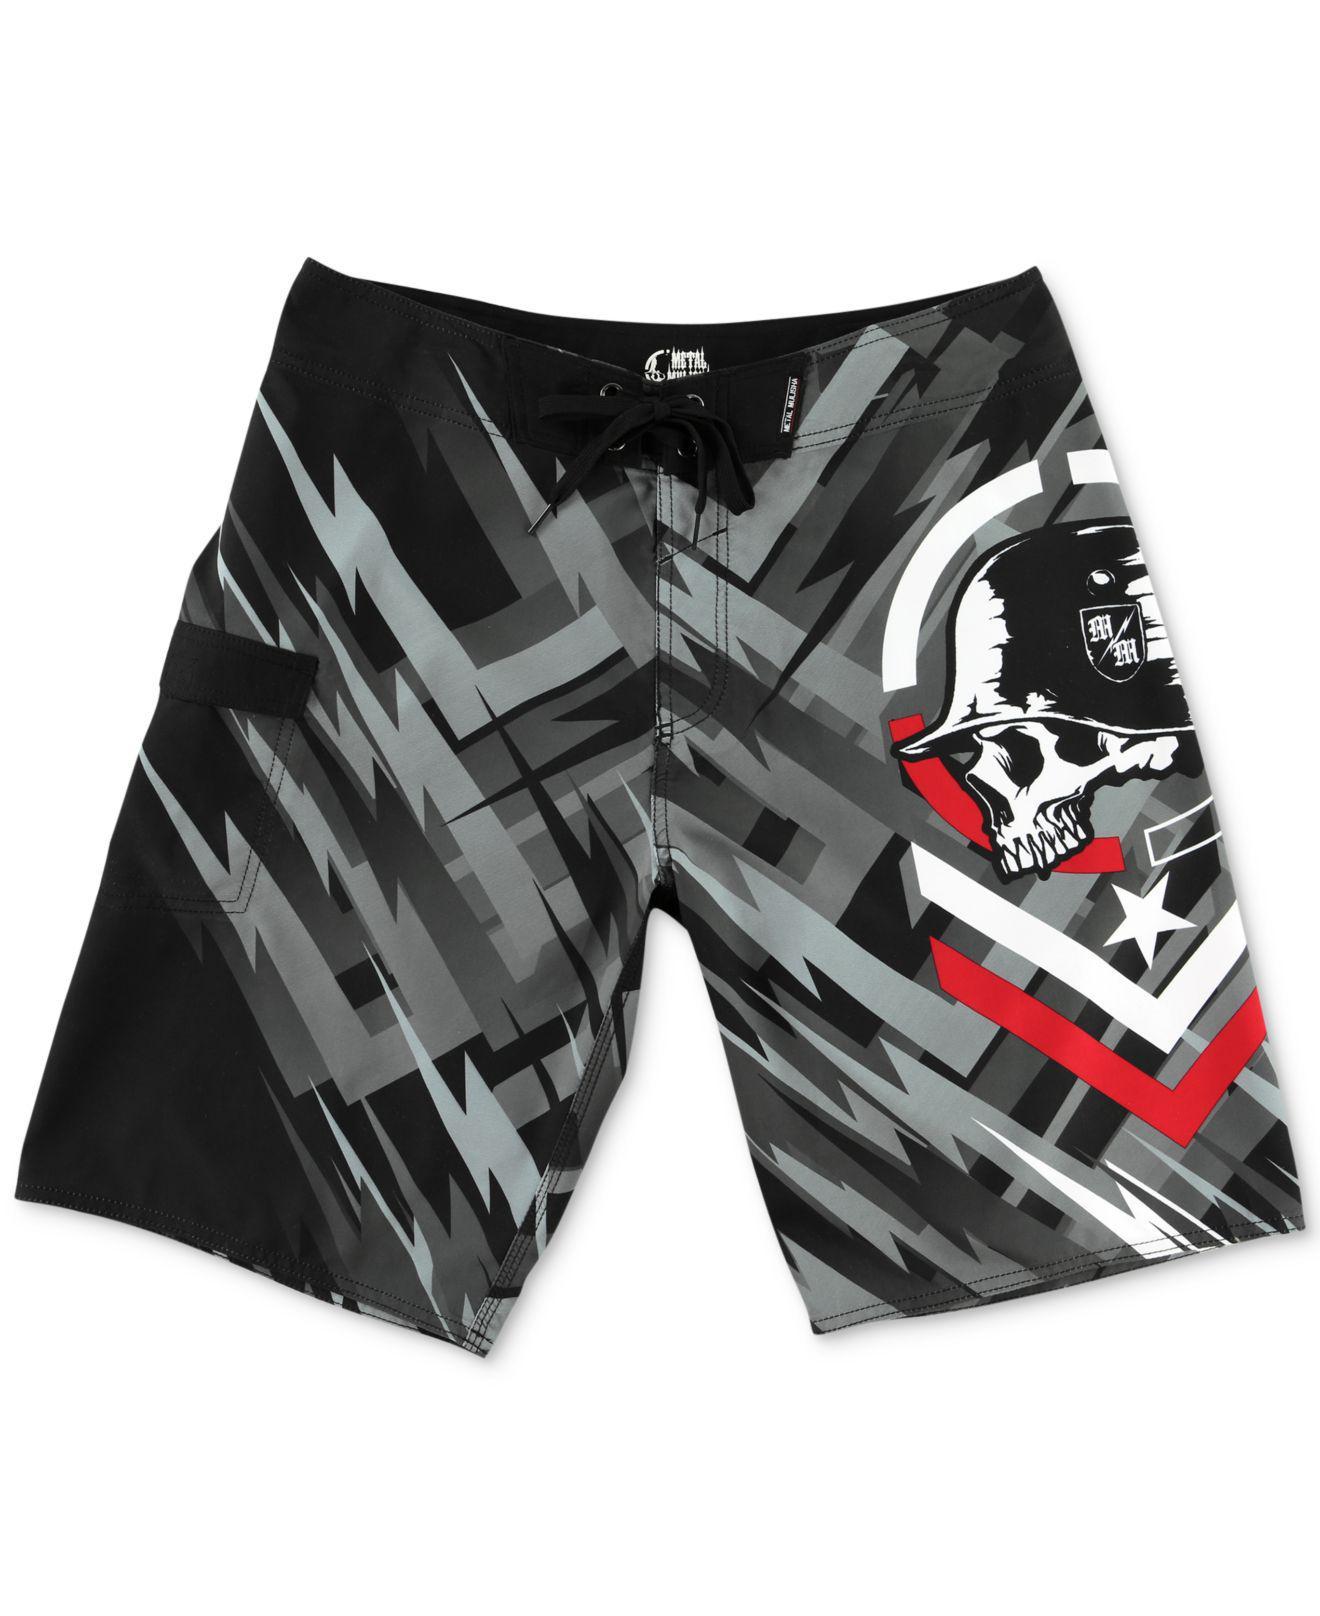 068e487fb6aa8 Metal Mulisha Men's Spark Graphic-print Logo Boardshorts in Black ...